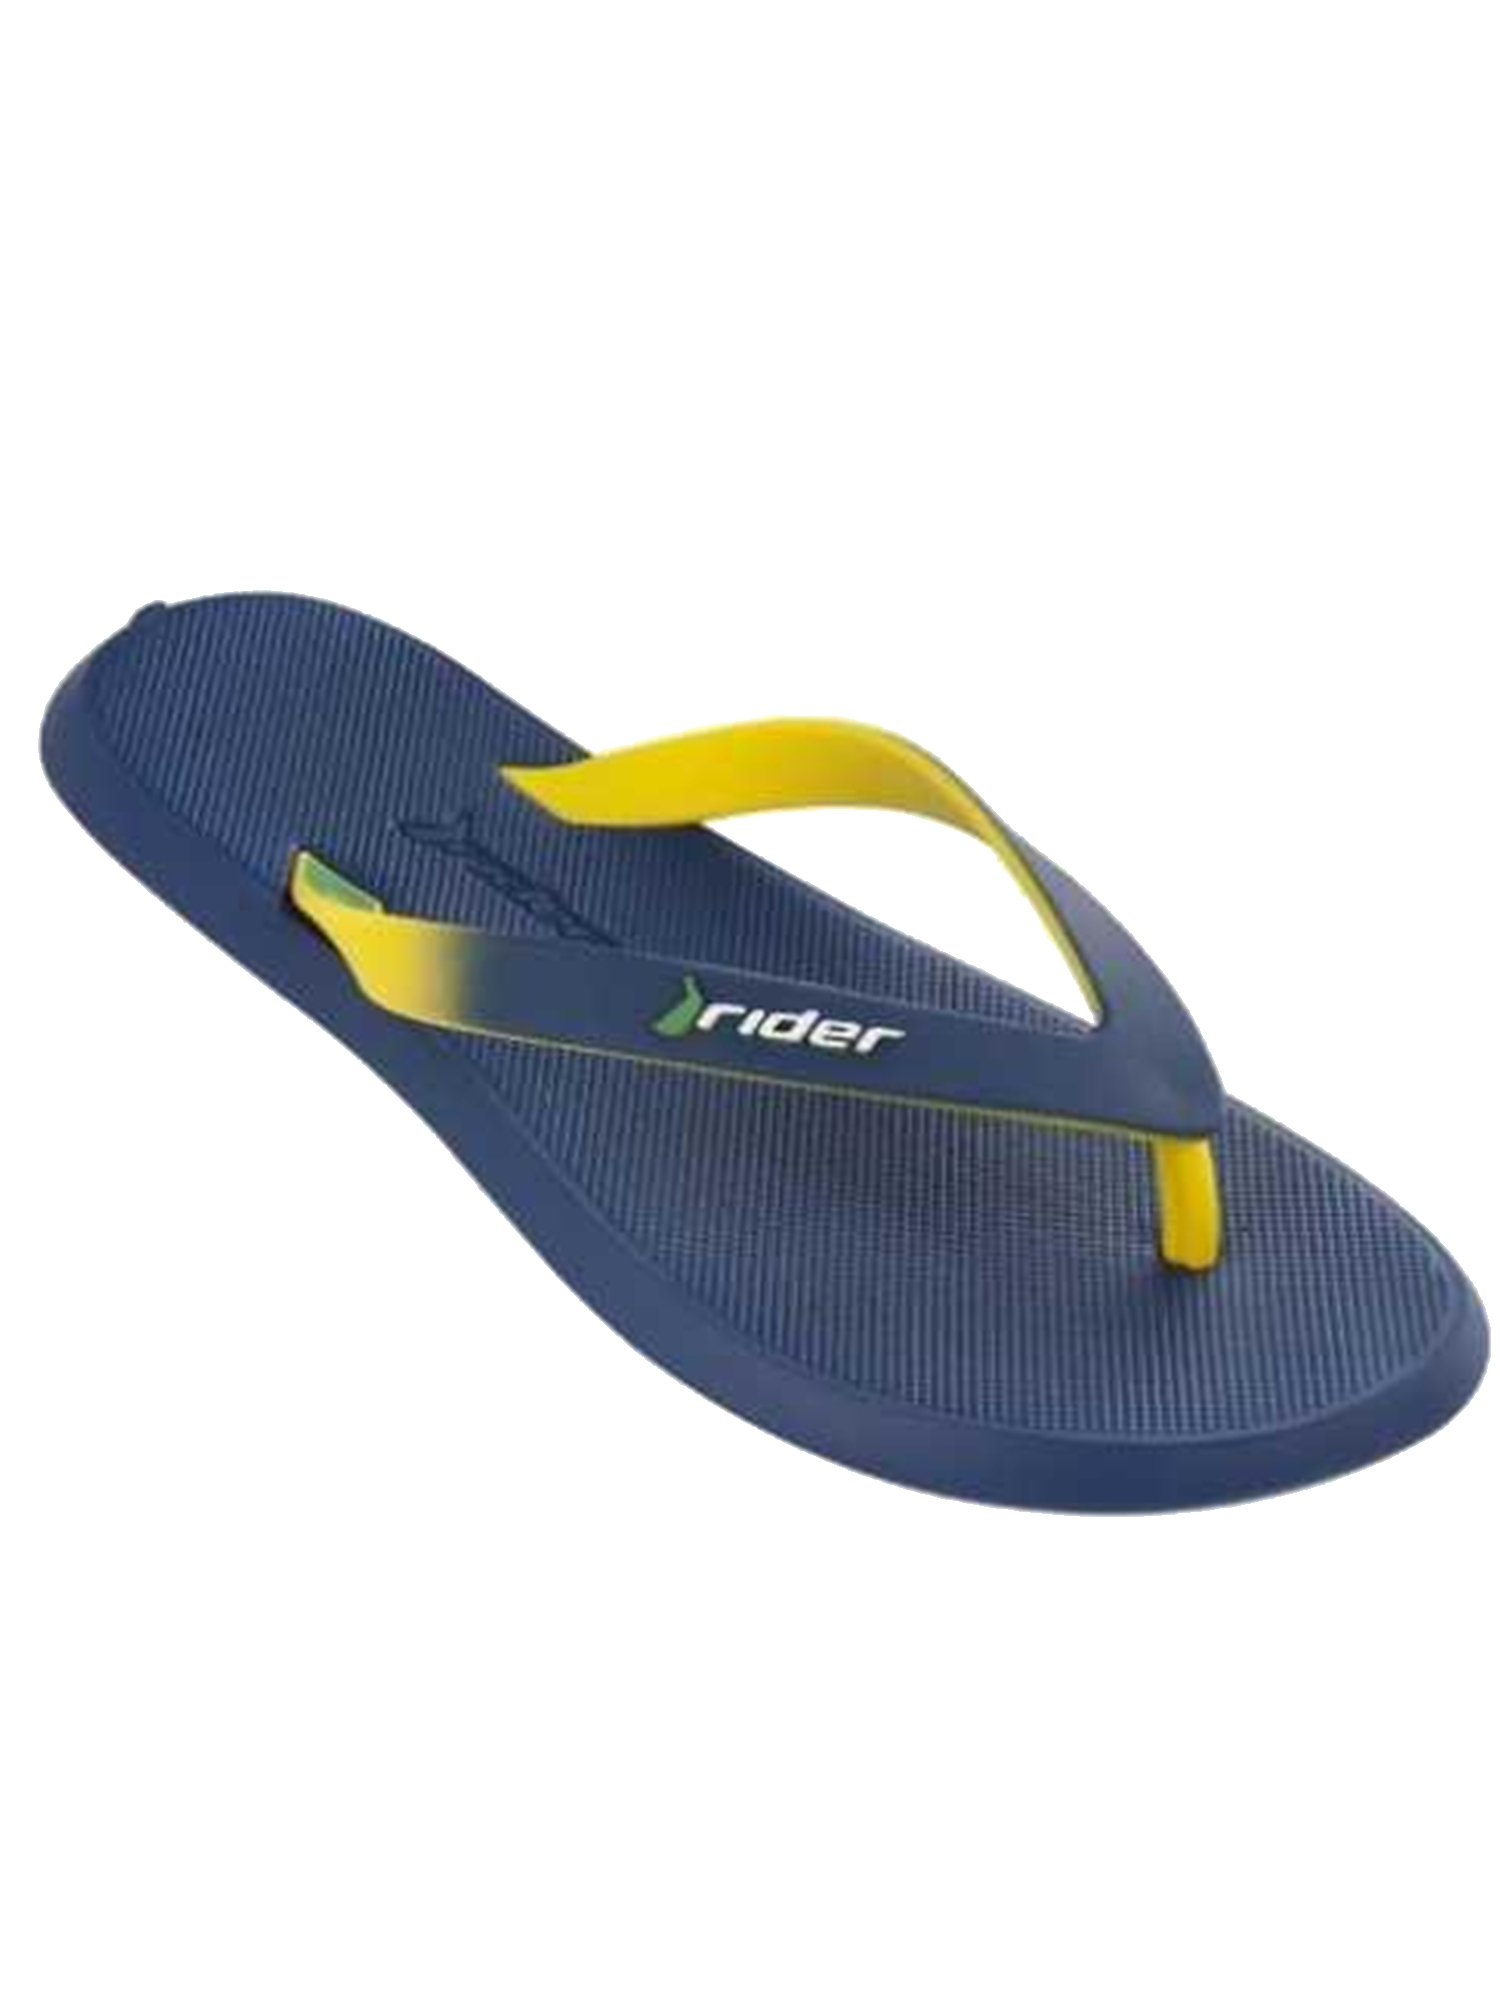 Rider Men's Brazil Thong Sandal (Blue;Size 10)